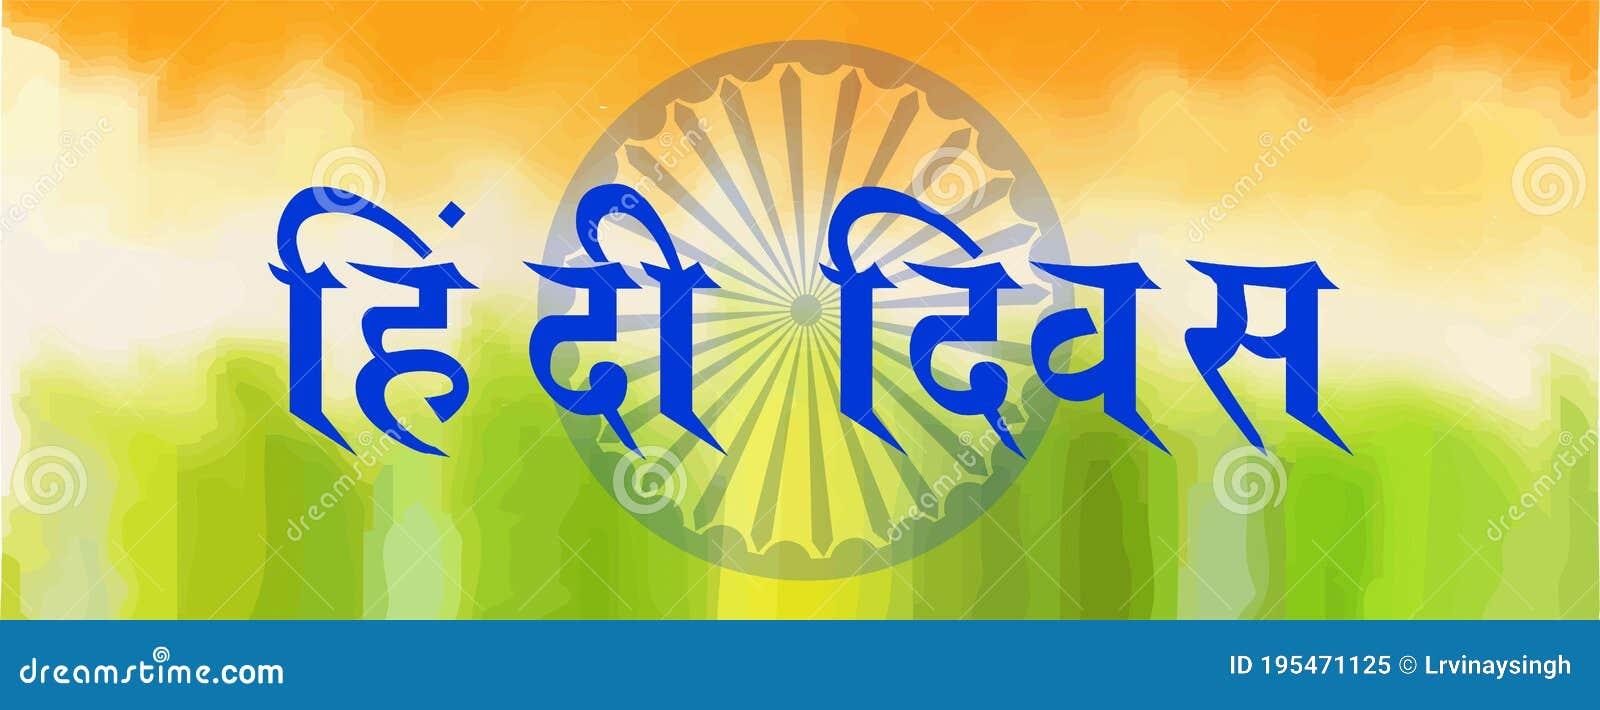 Hindi Diwas Stock Illustrations – 20 Hindi Diwas Stock ...